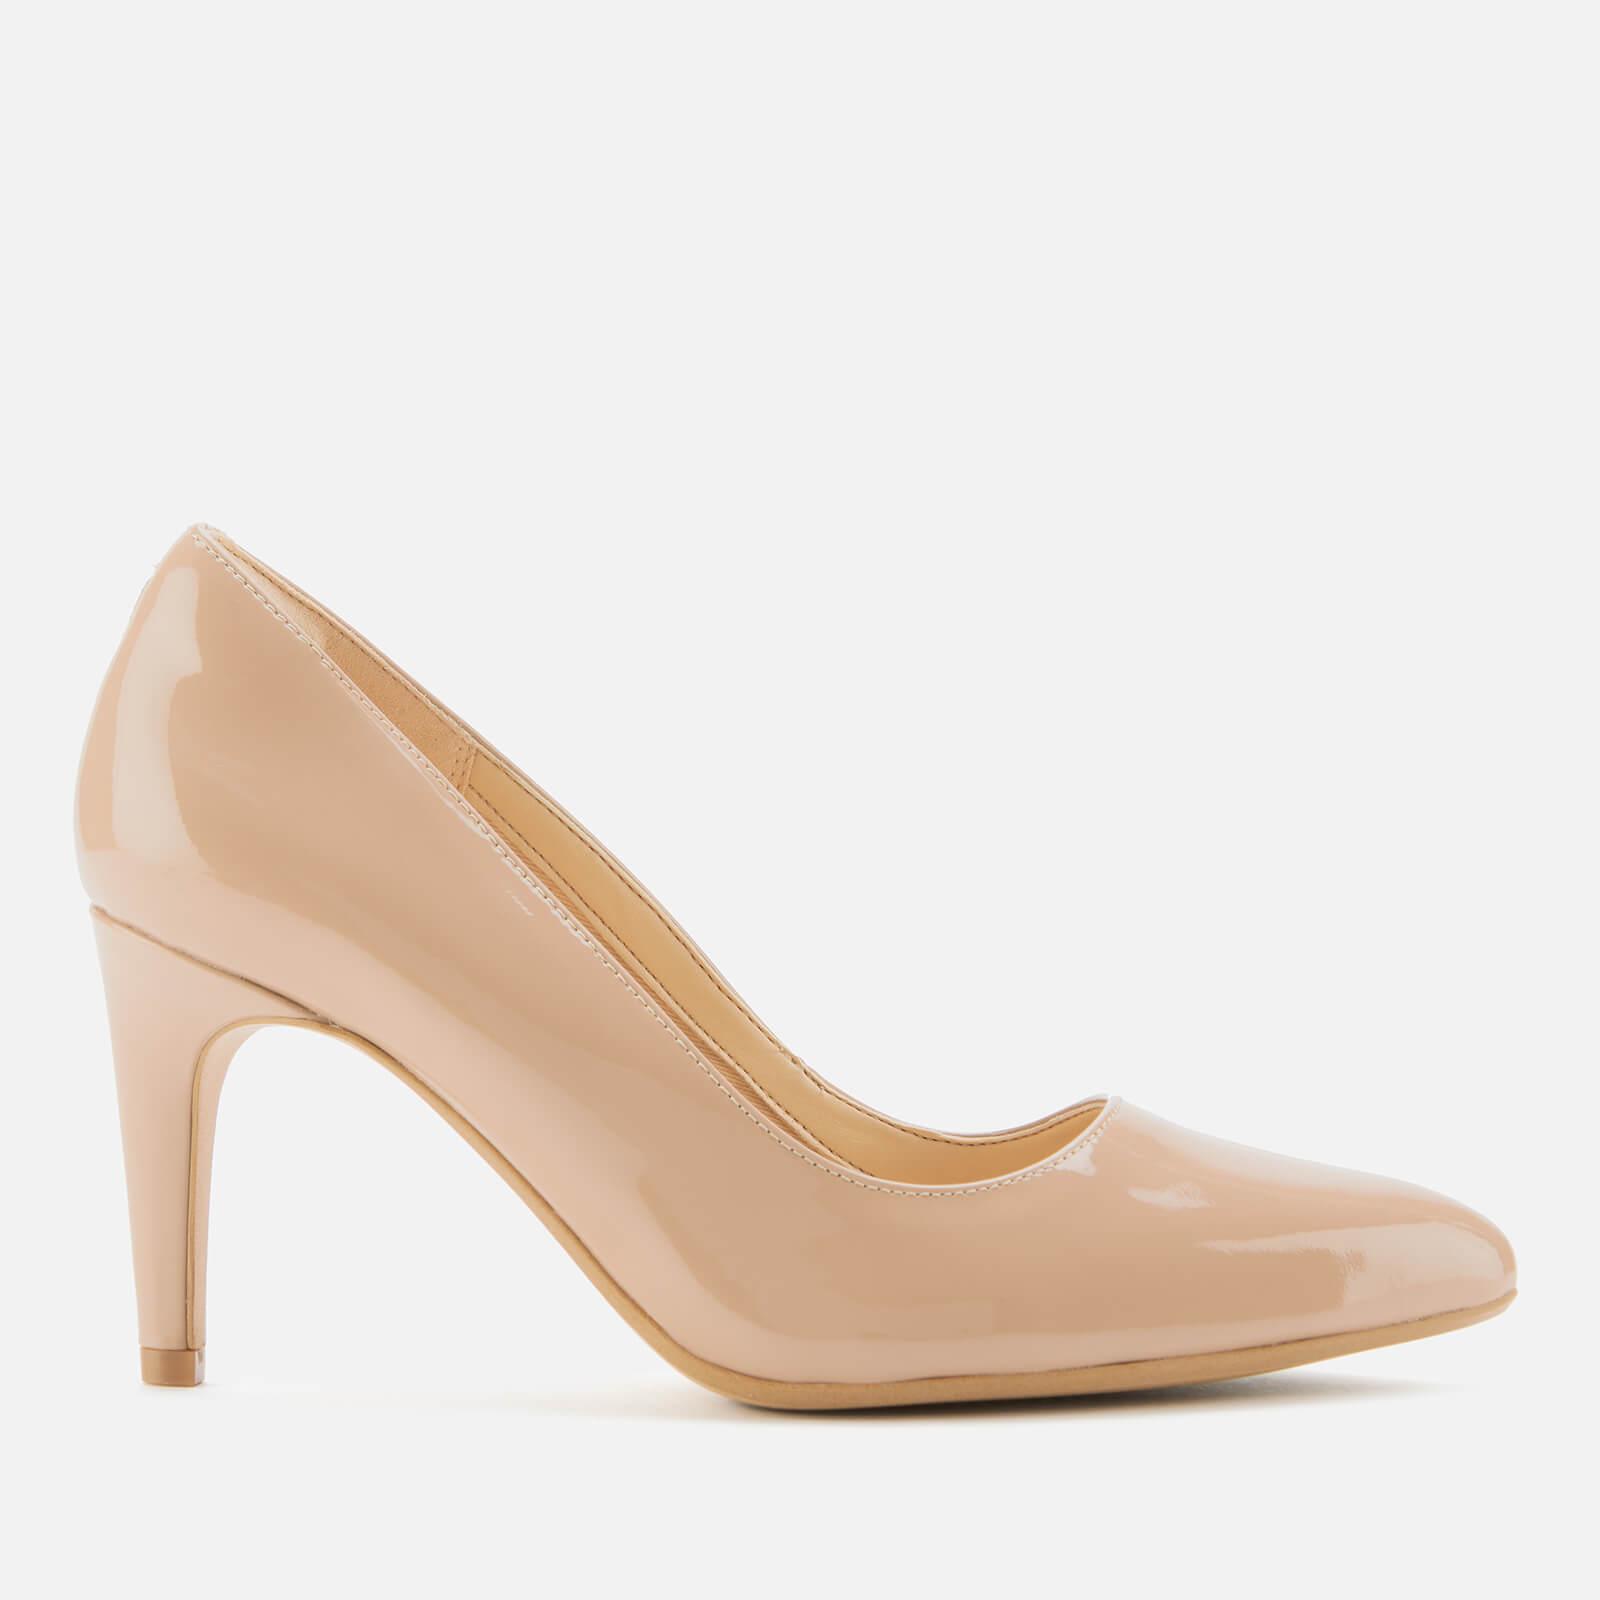 Clarks Women's Laina Rae Patent Court Shoes - Praline - UK 7